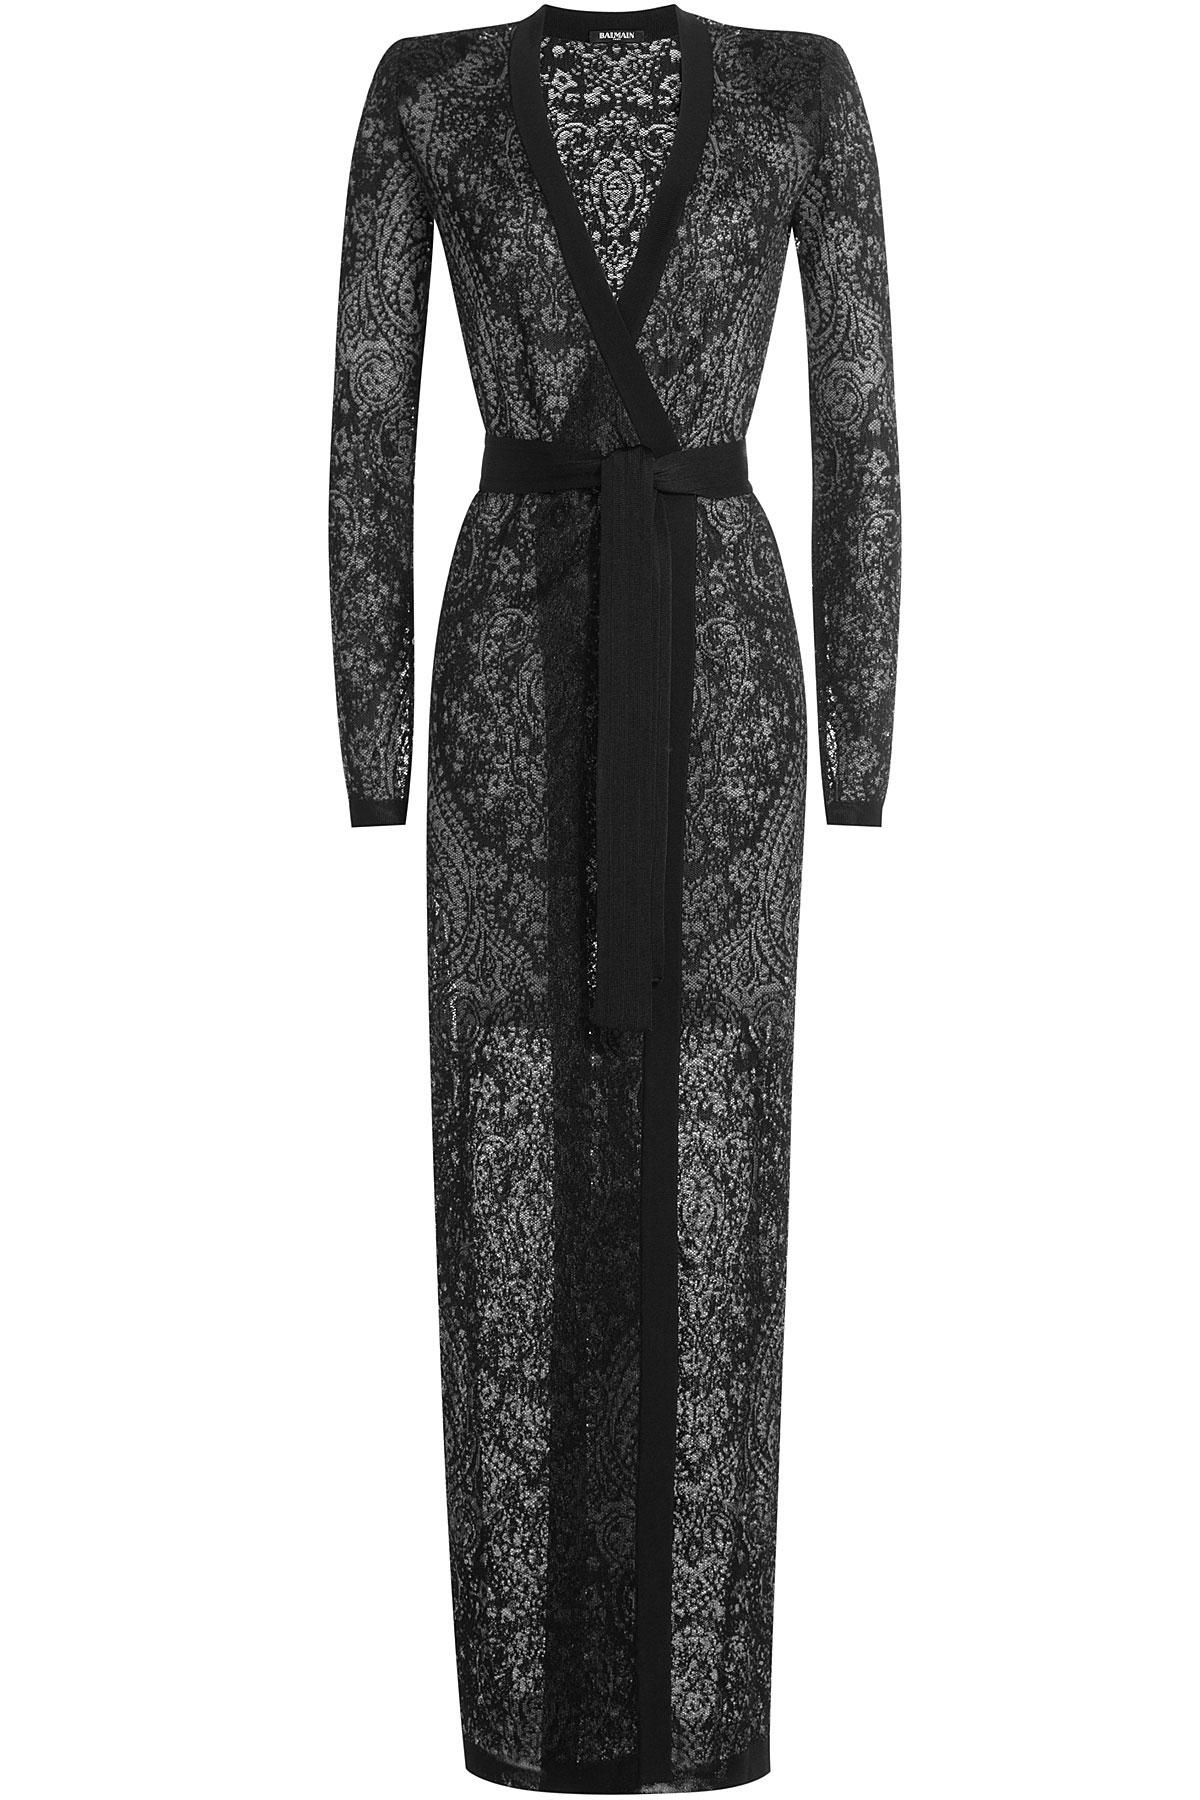 Balmain Floor Length Knit Cardigan  Black in Black  Lyst